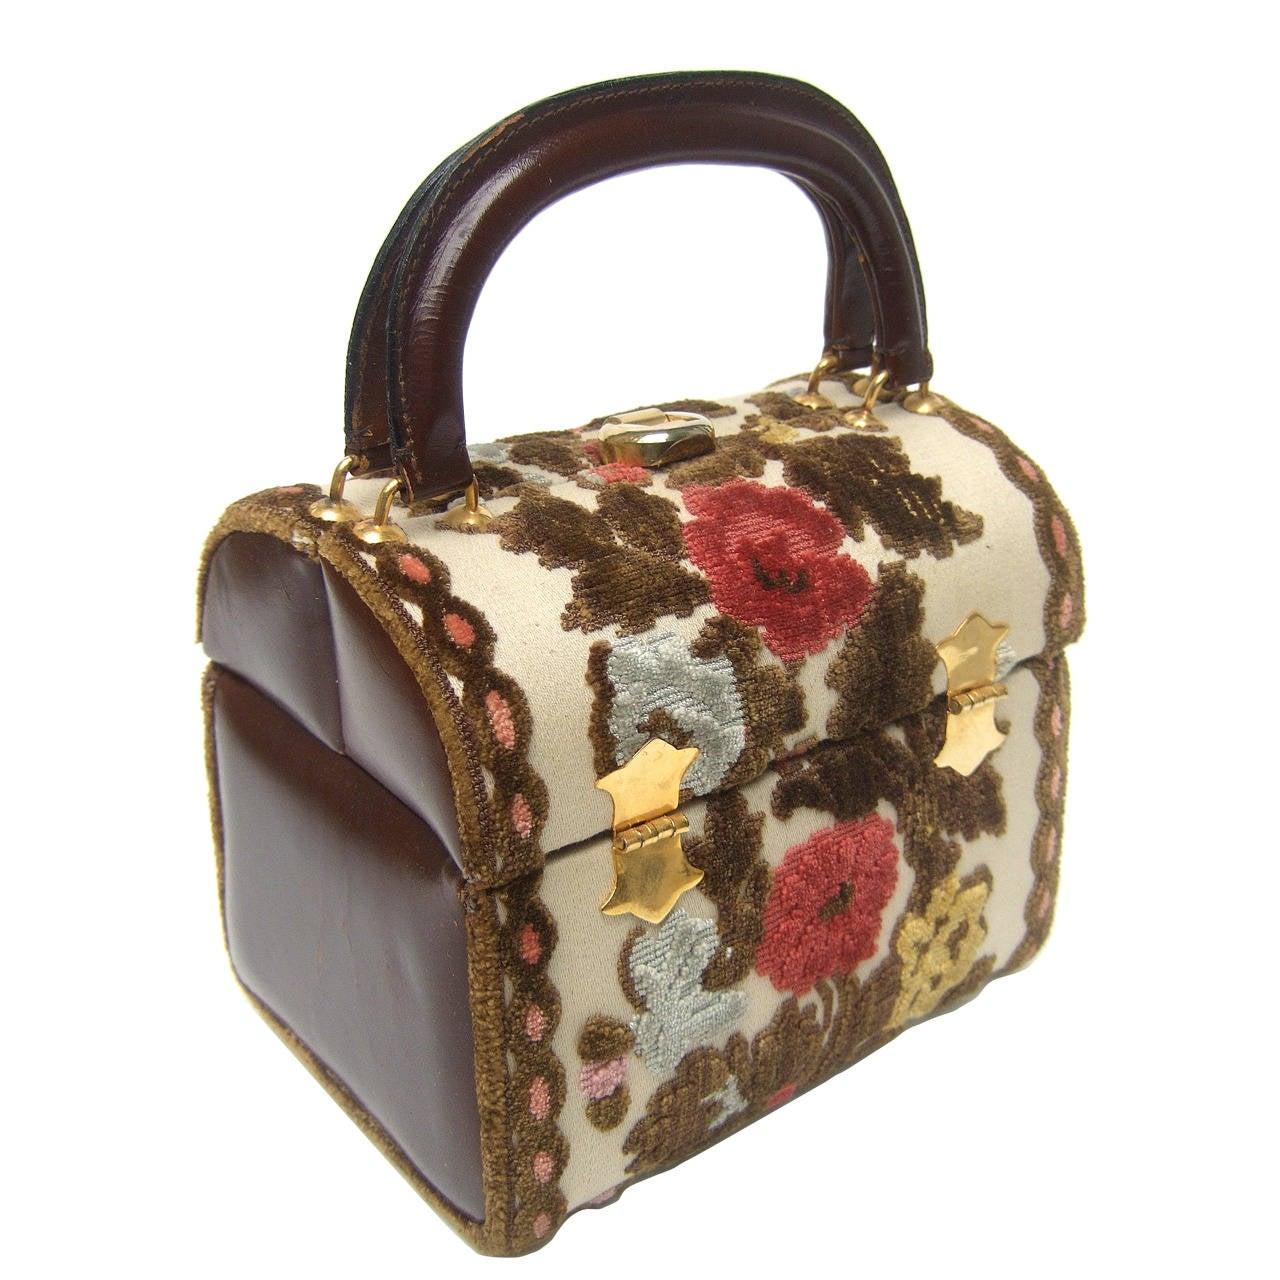 f2e6baac4872 Brocade Box Style Handbag Designed by Tano of Madrid c 1970 at 1stdibs